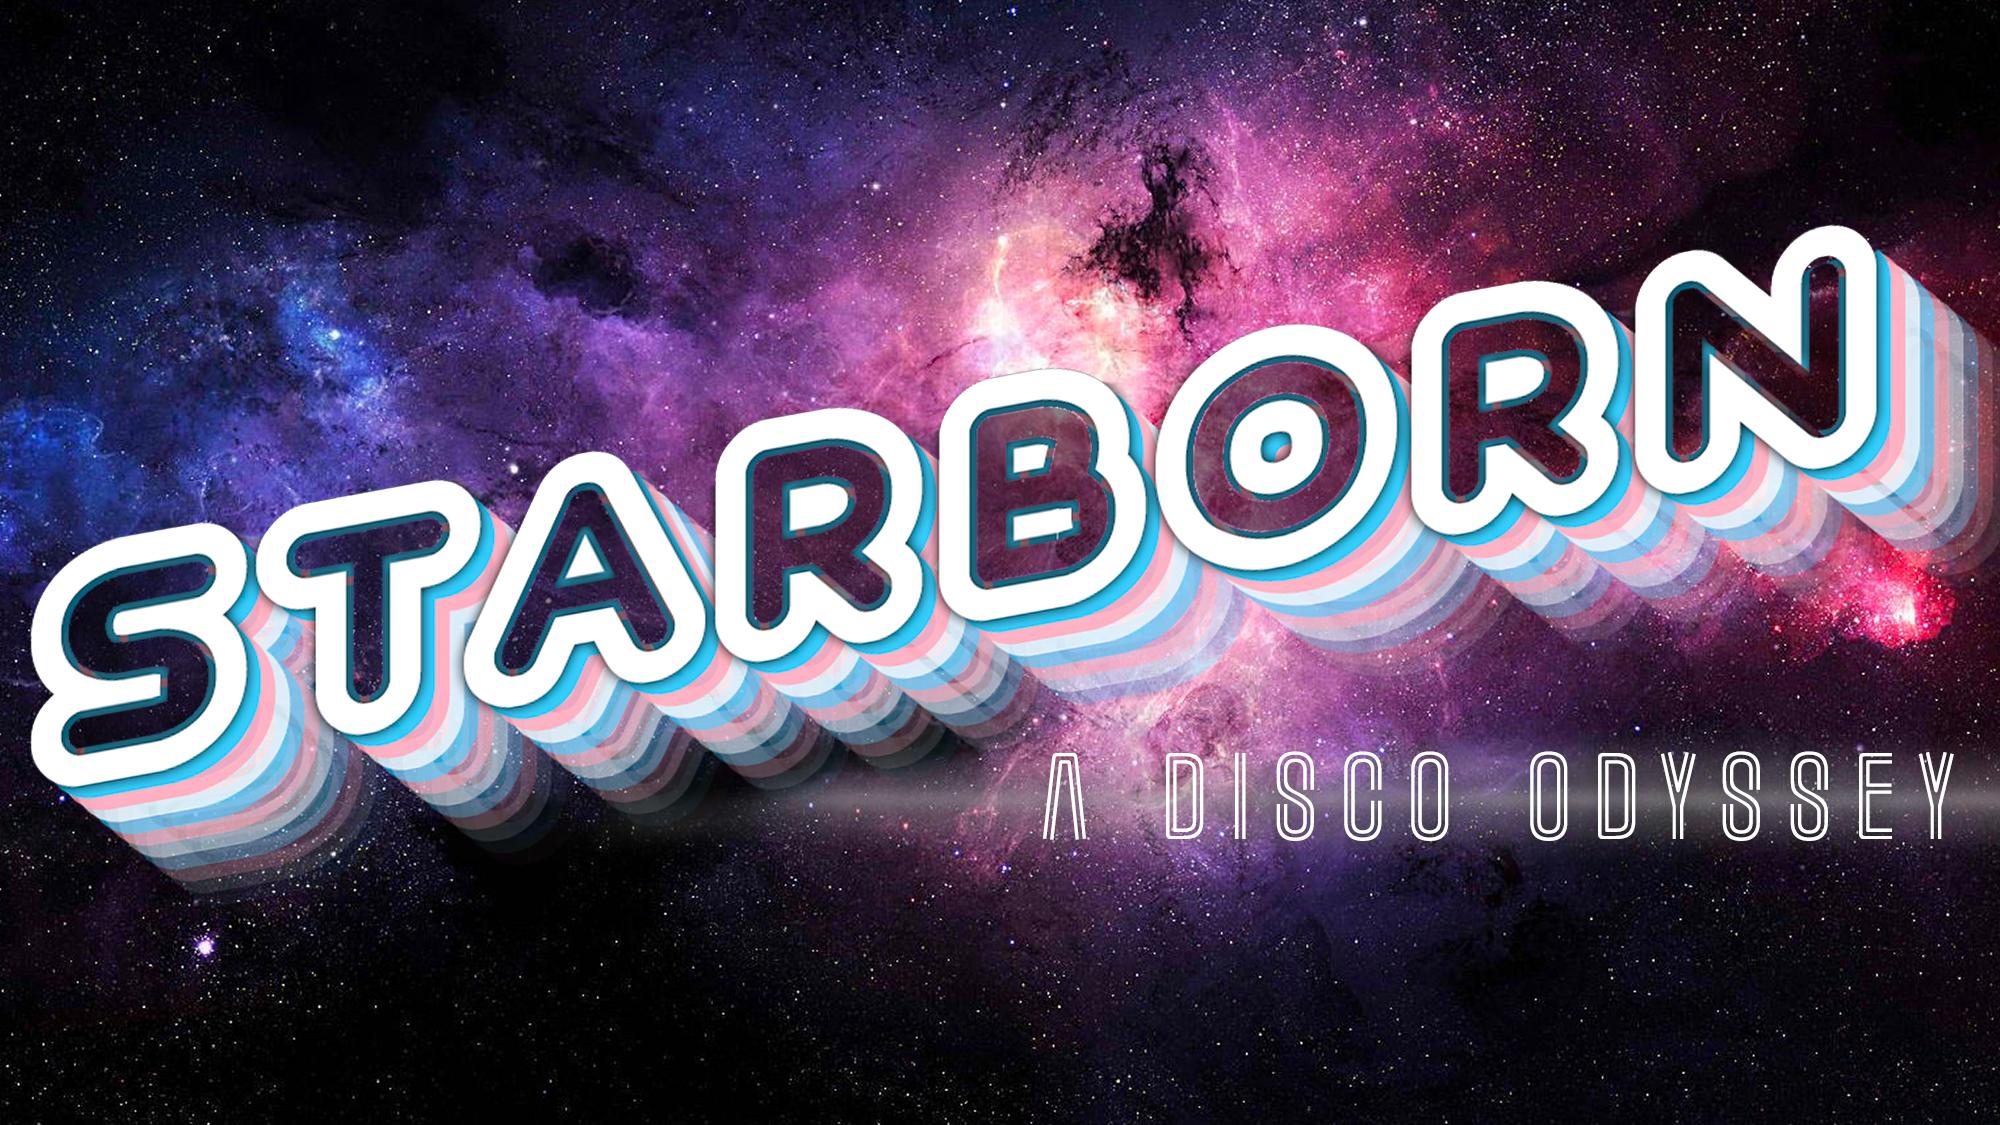 Starborn: A Disco Odyssey